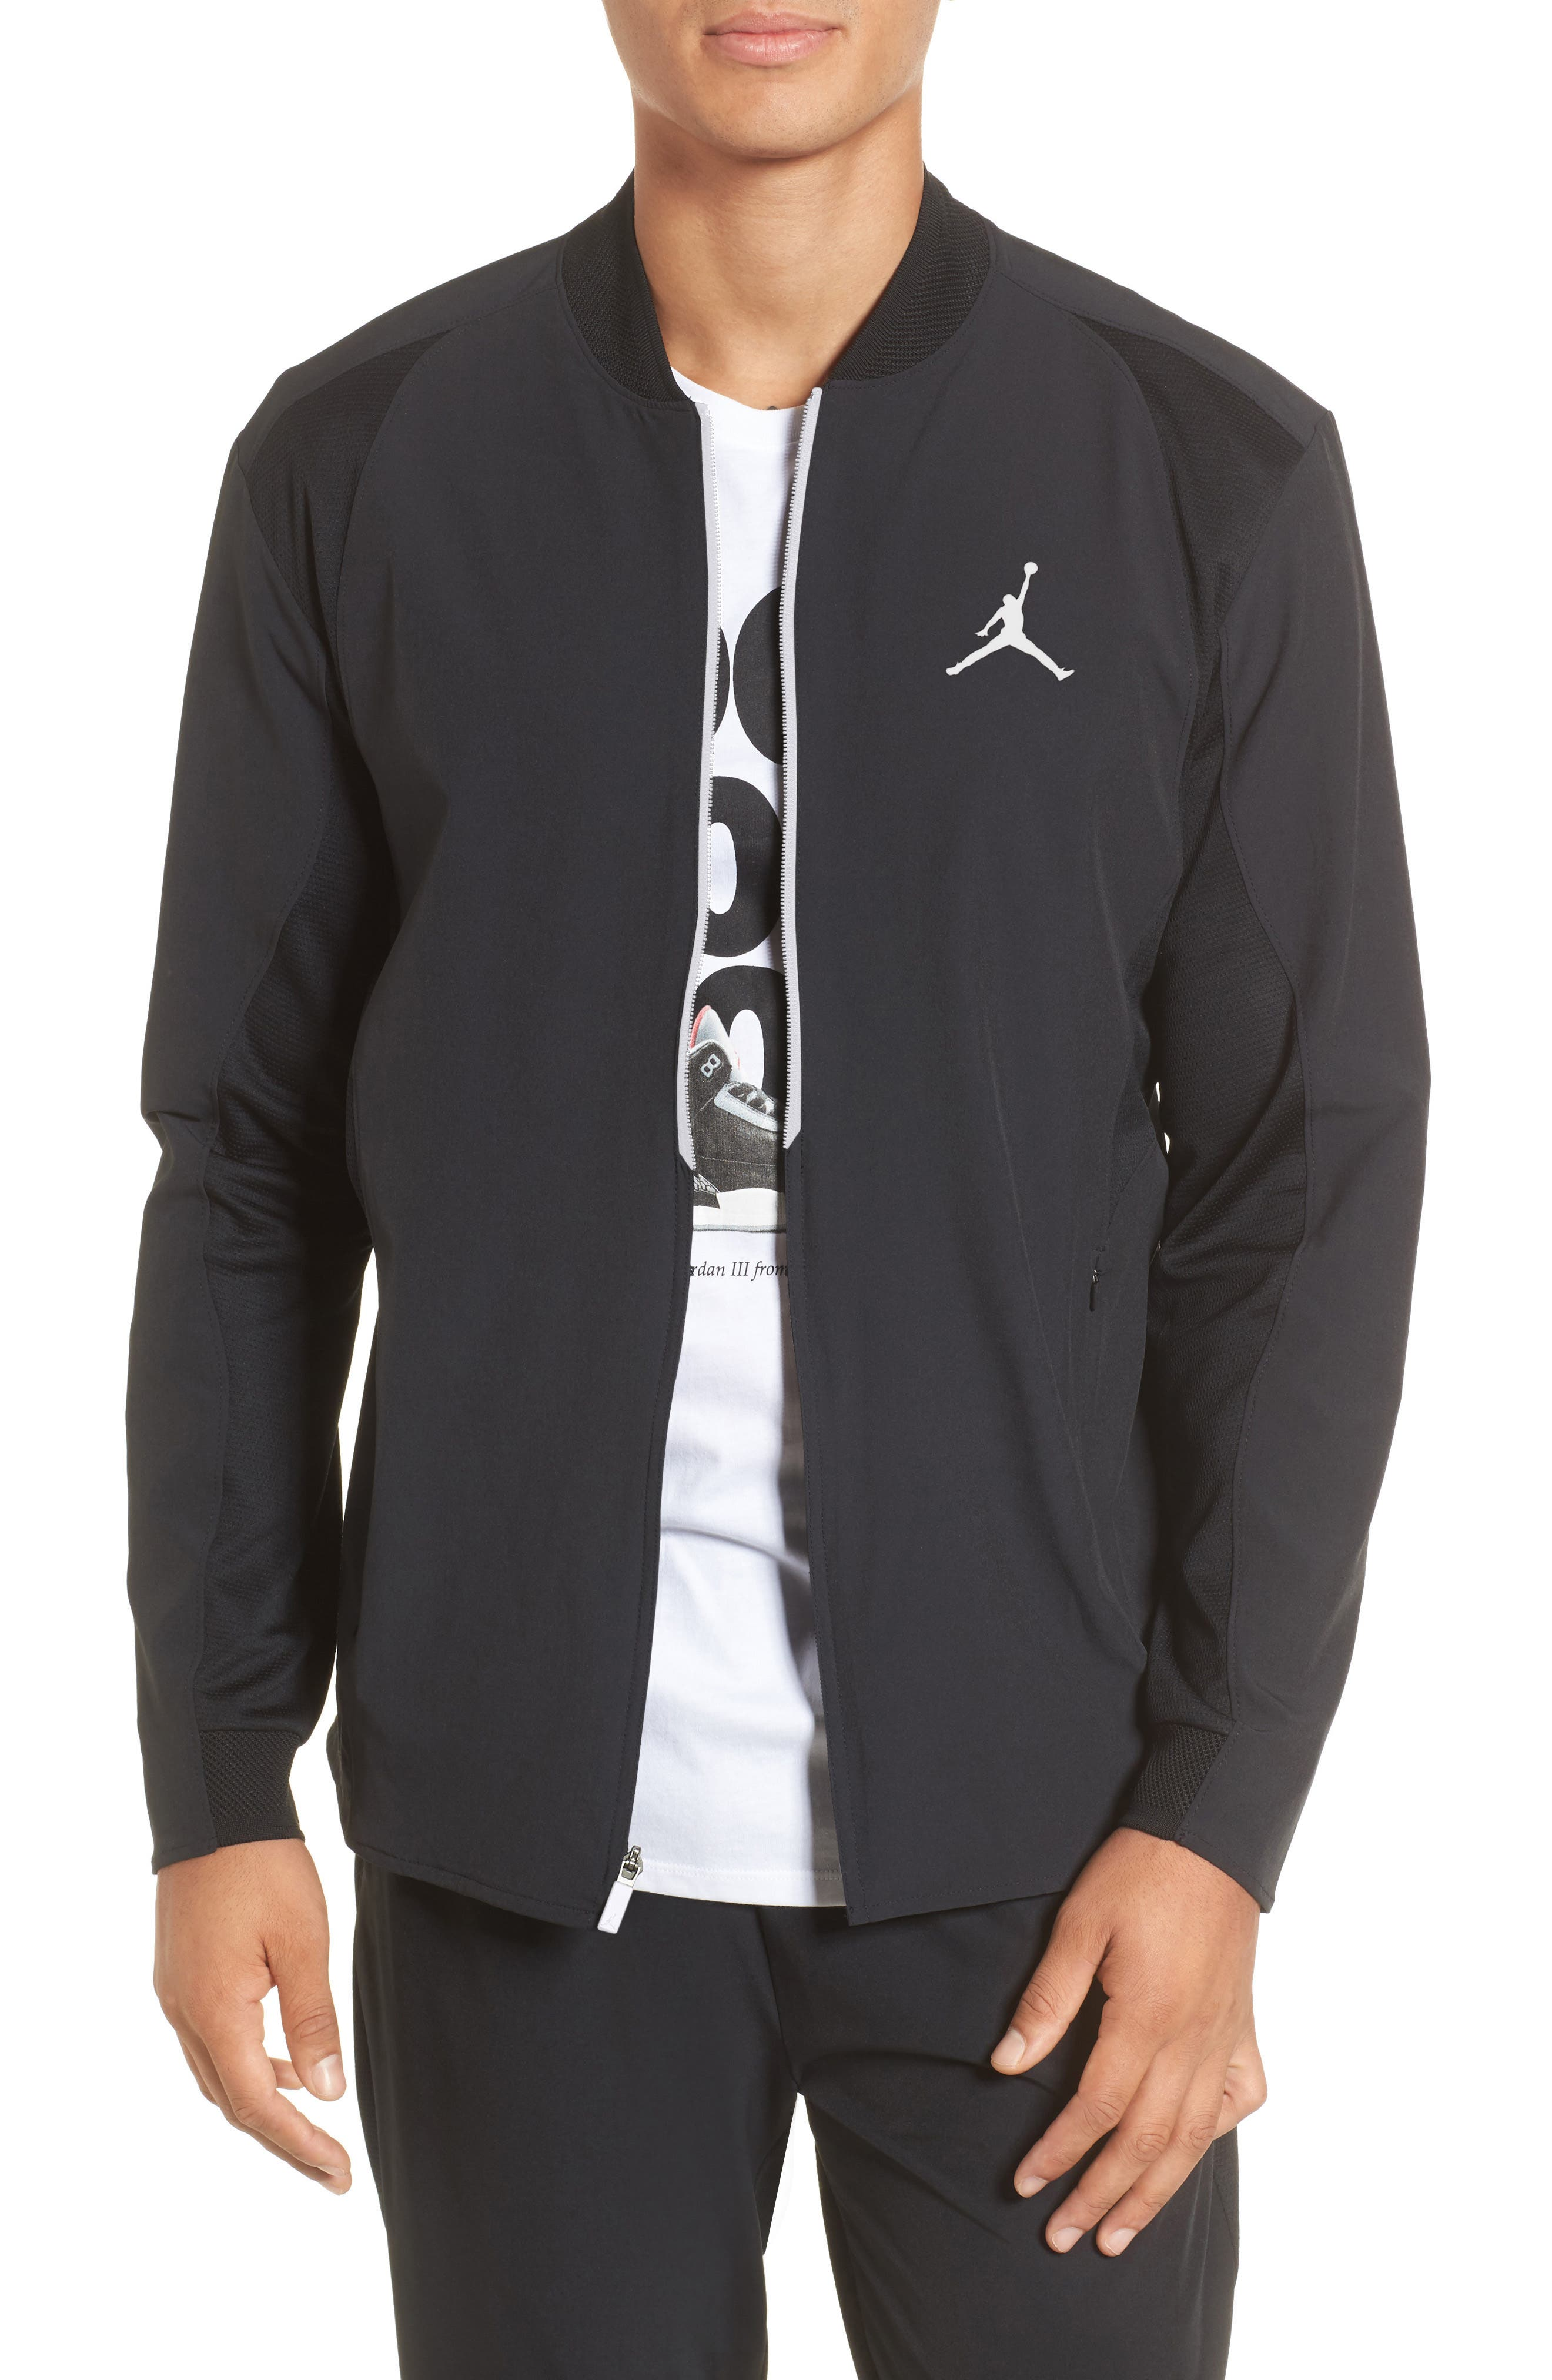 23 Alpha Dry Jacket,                         Main,                         color, 010